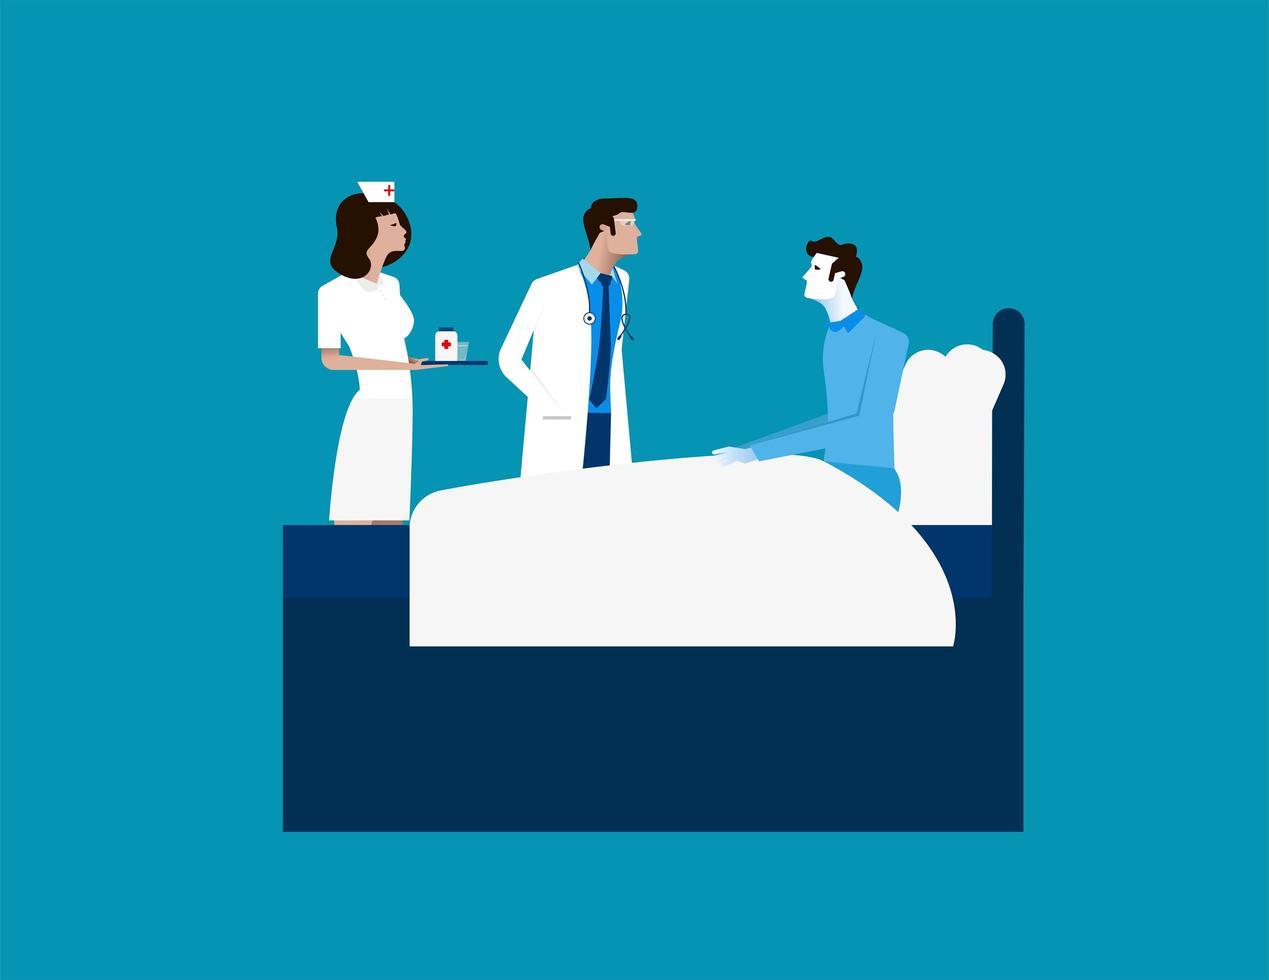 Doctor Healthcare Hospital Workers vector